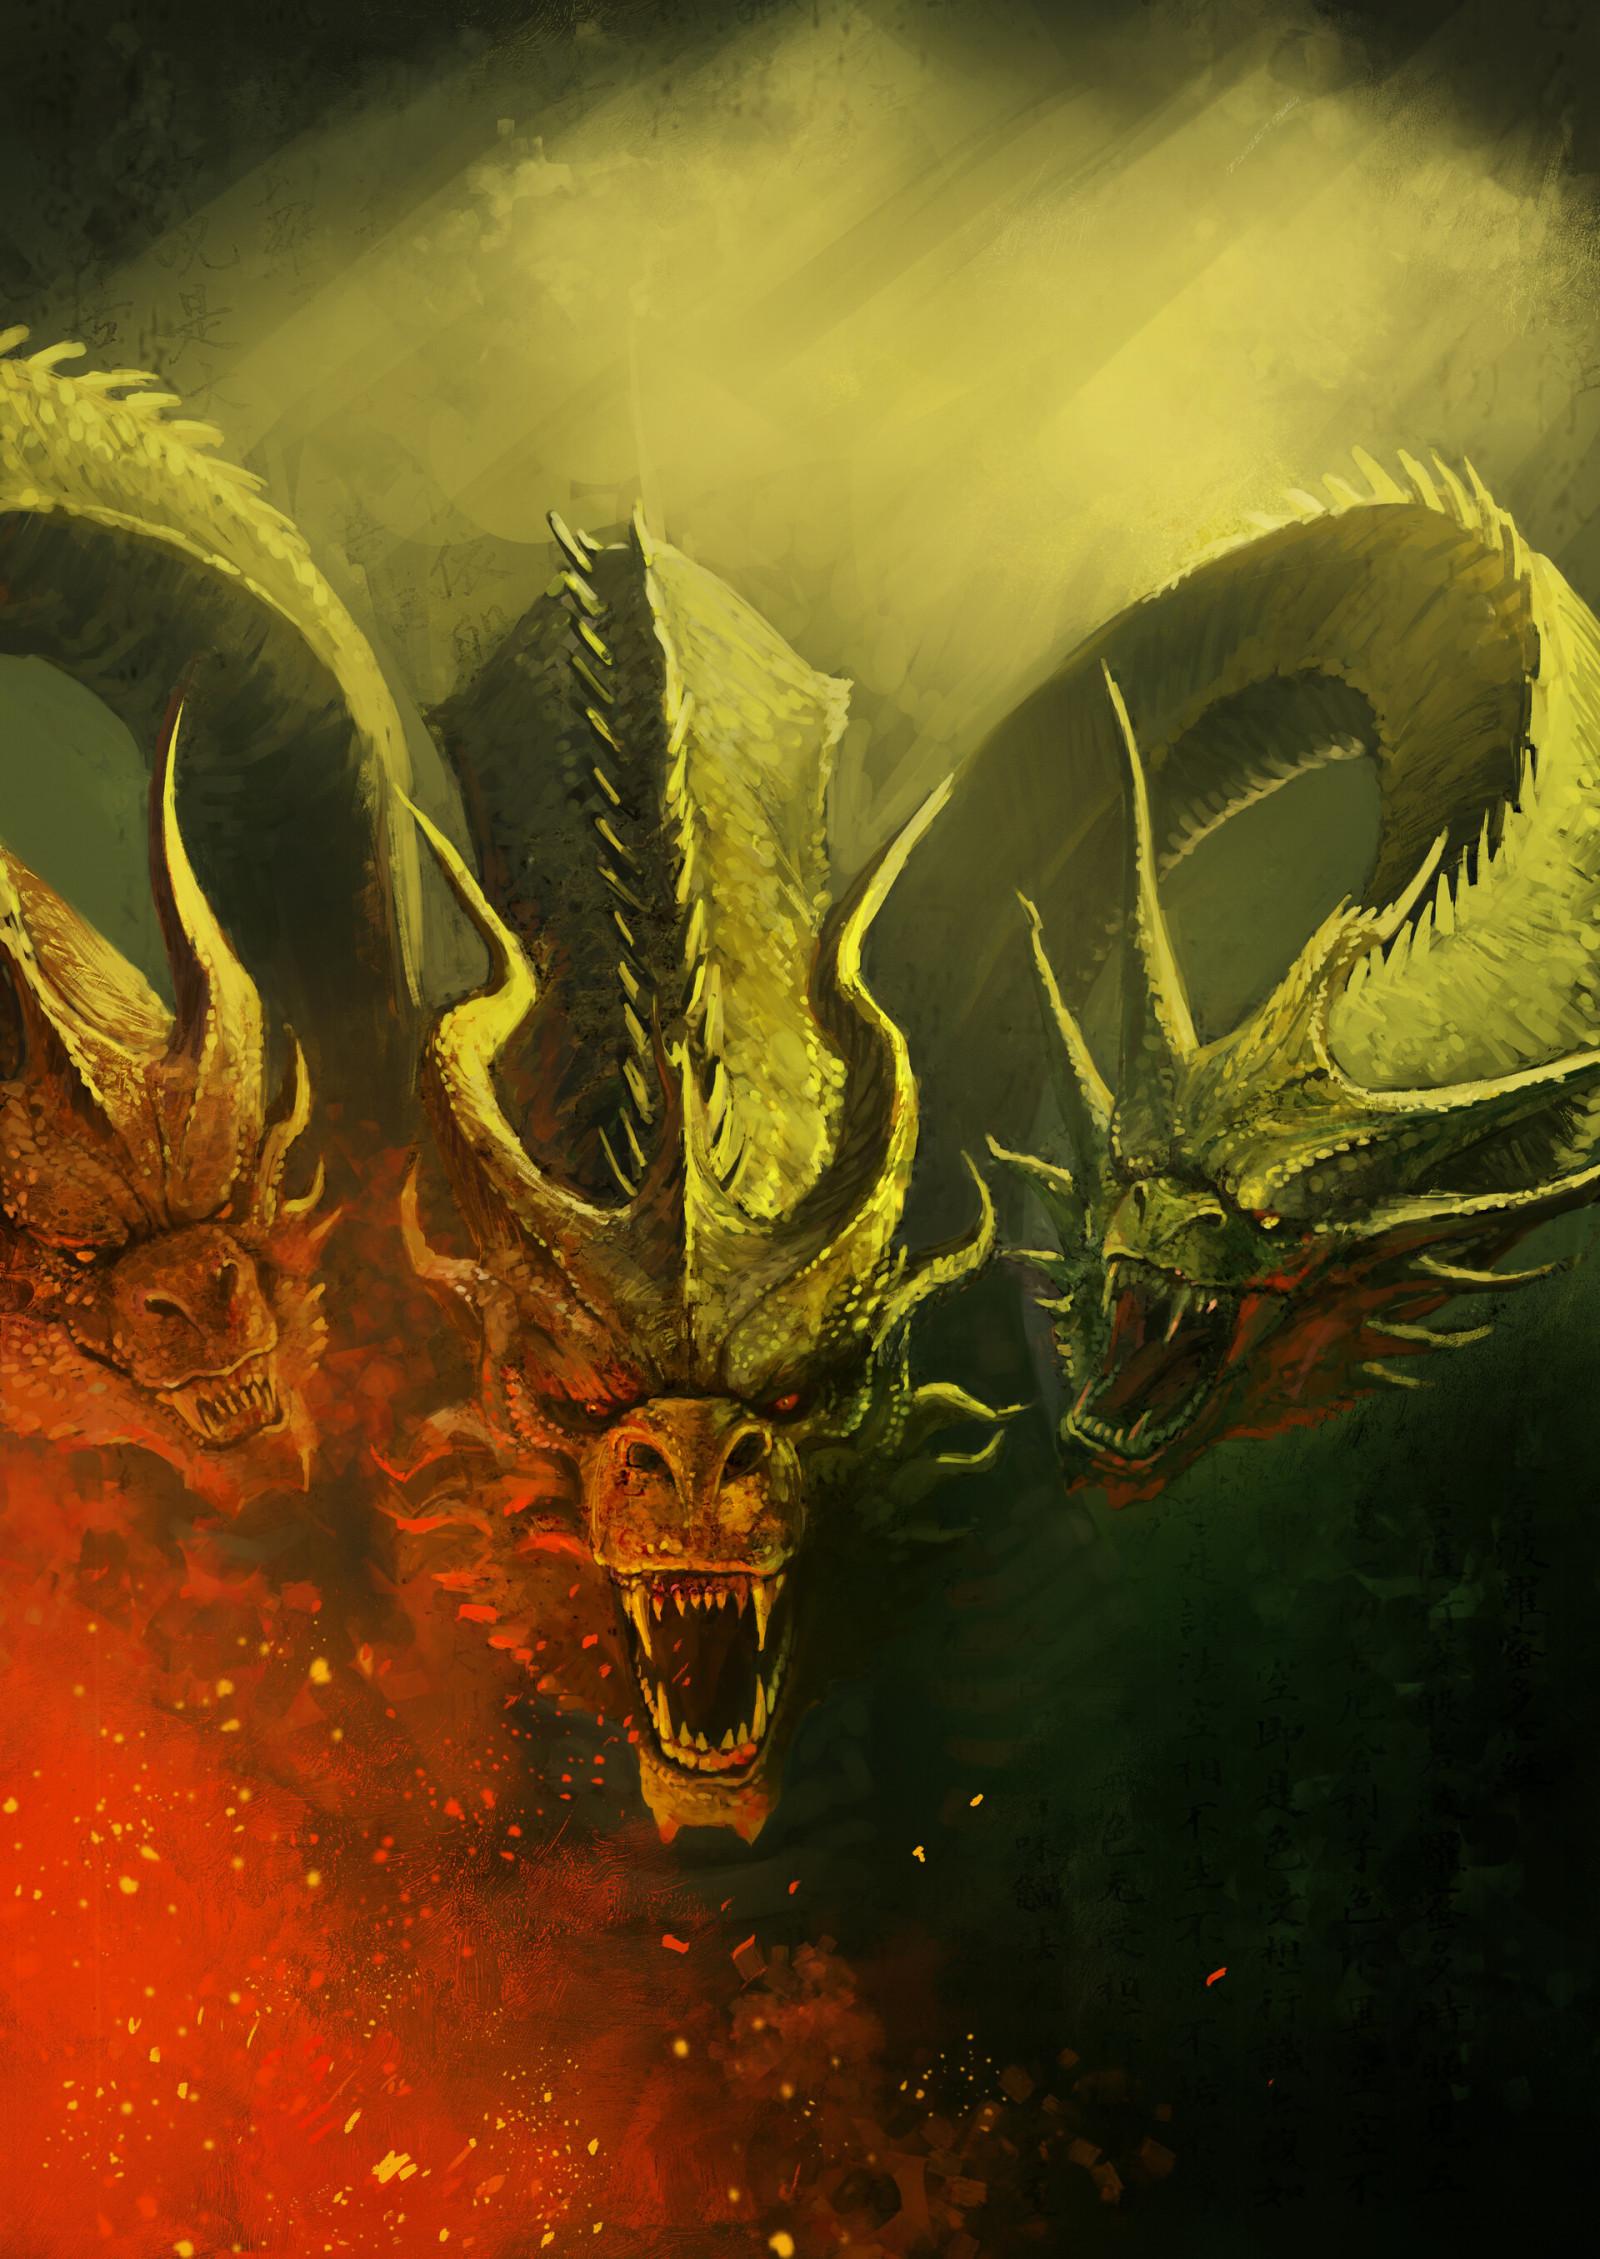 Wallpaper : digital art, artwork, King Ghidorah, Godzilla ...